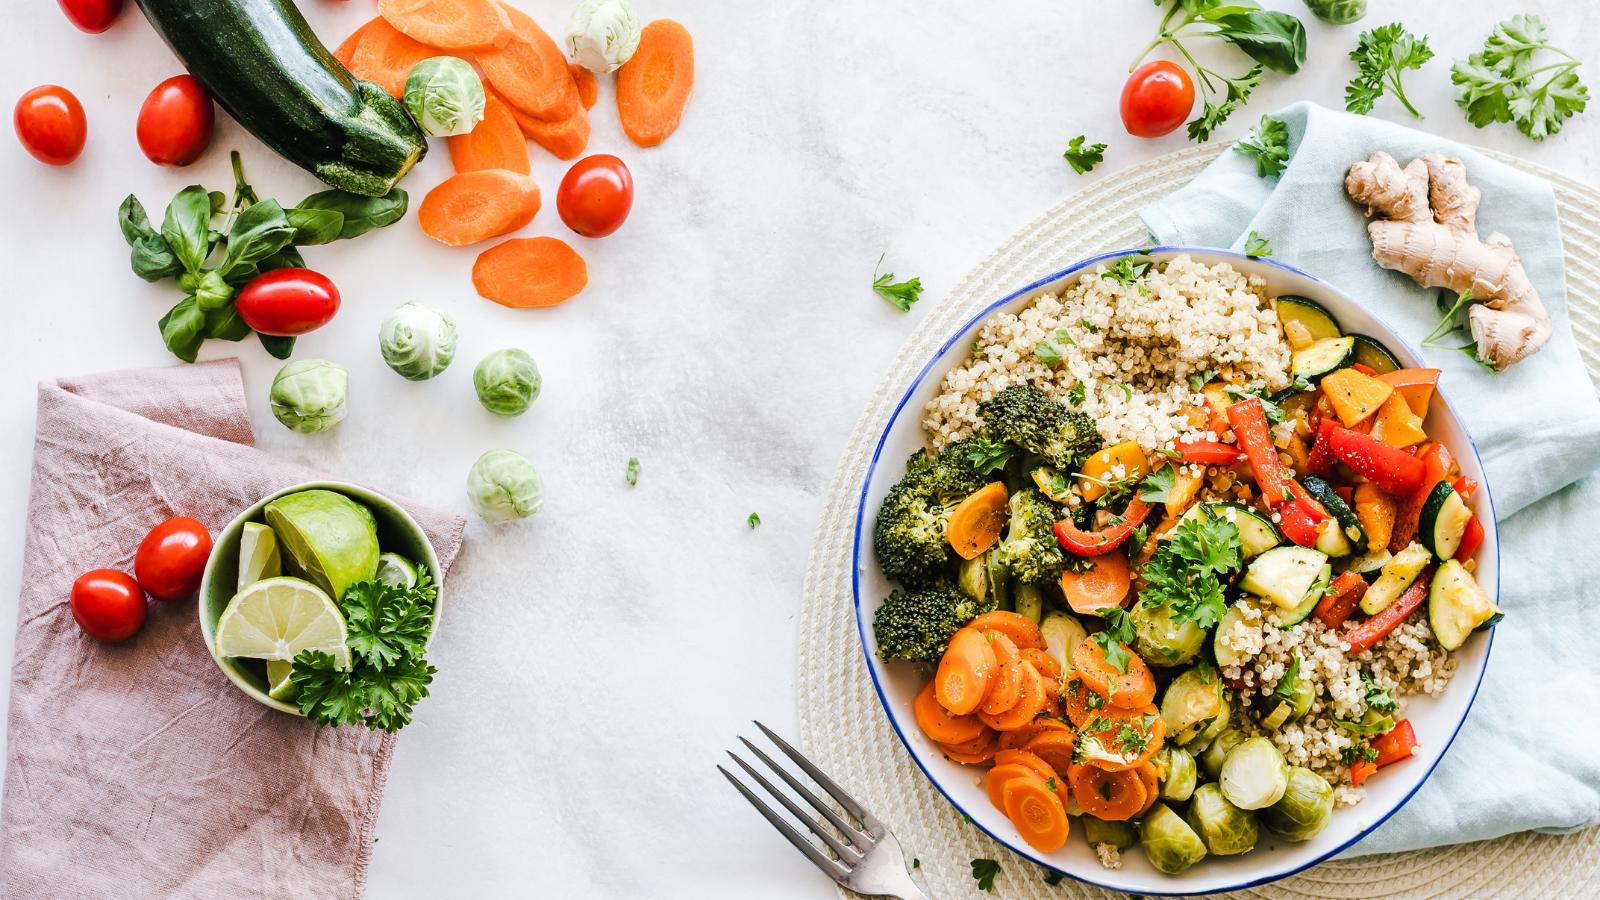 High fiber food help with IBS